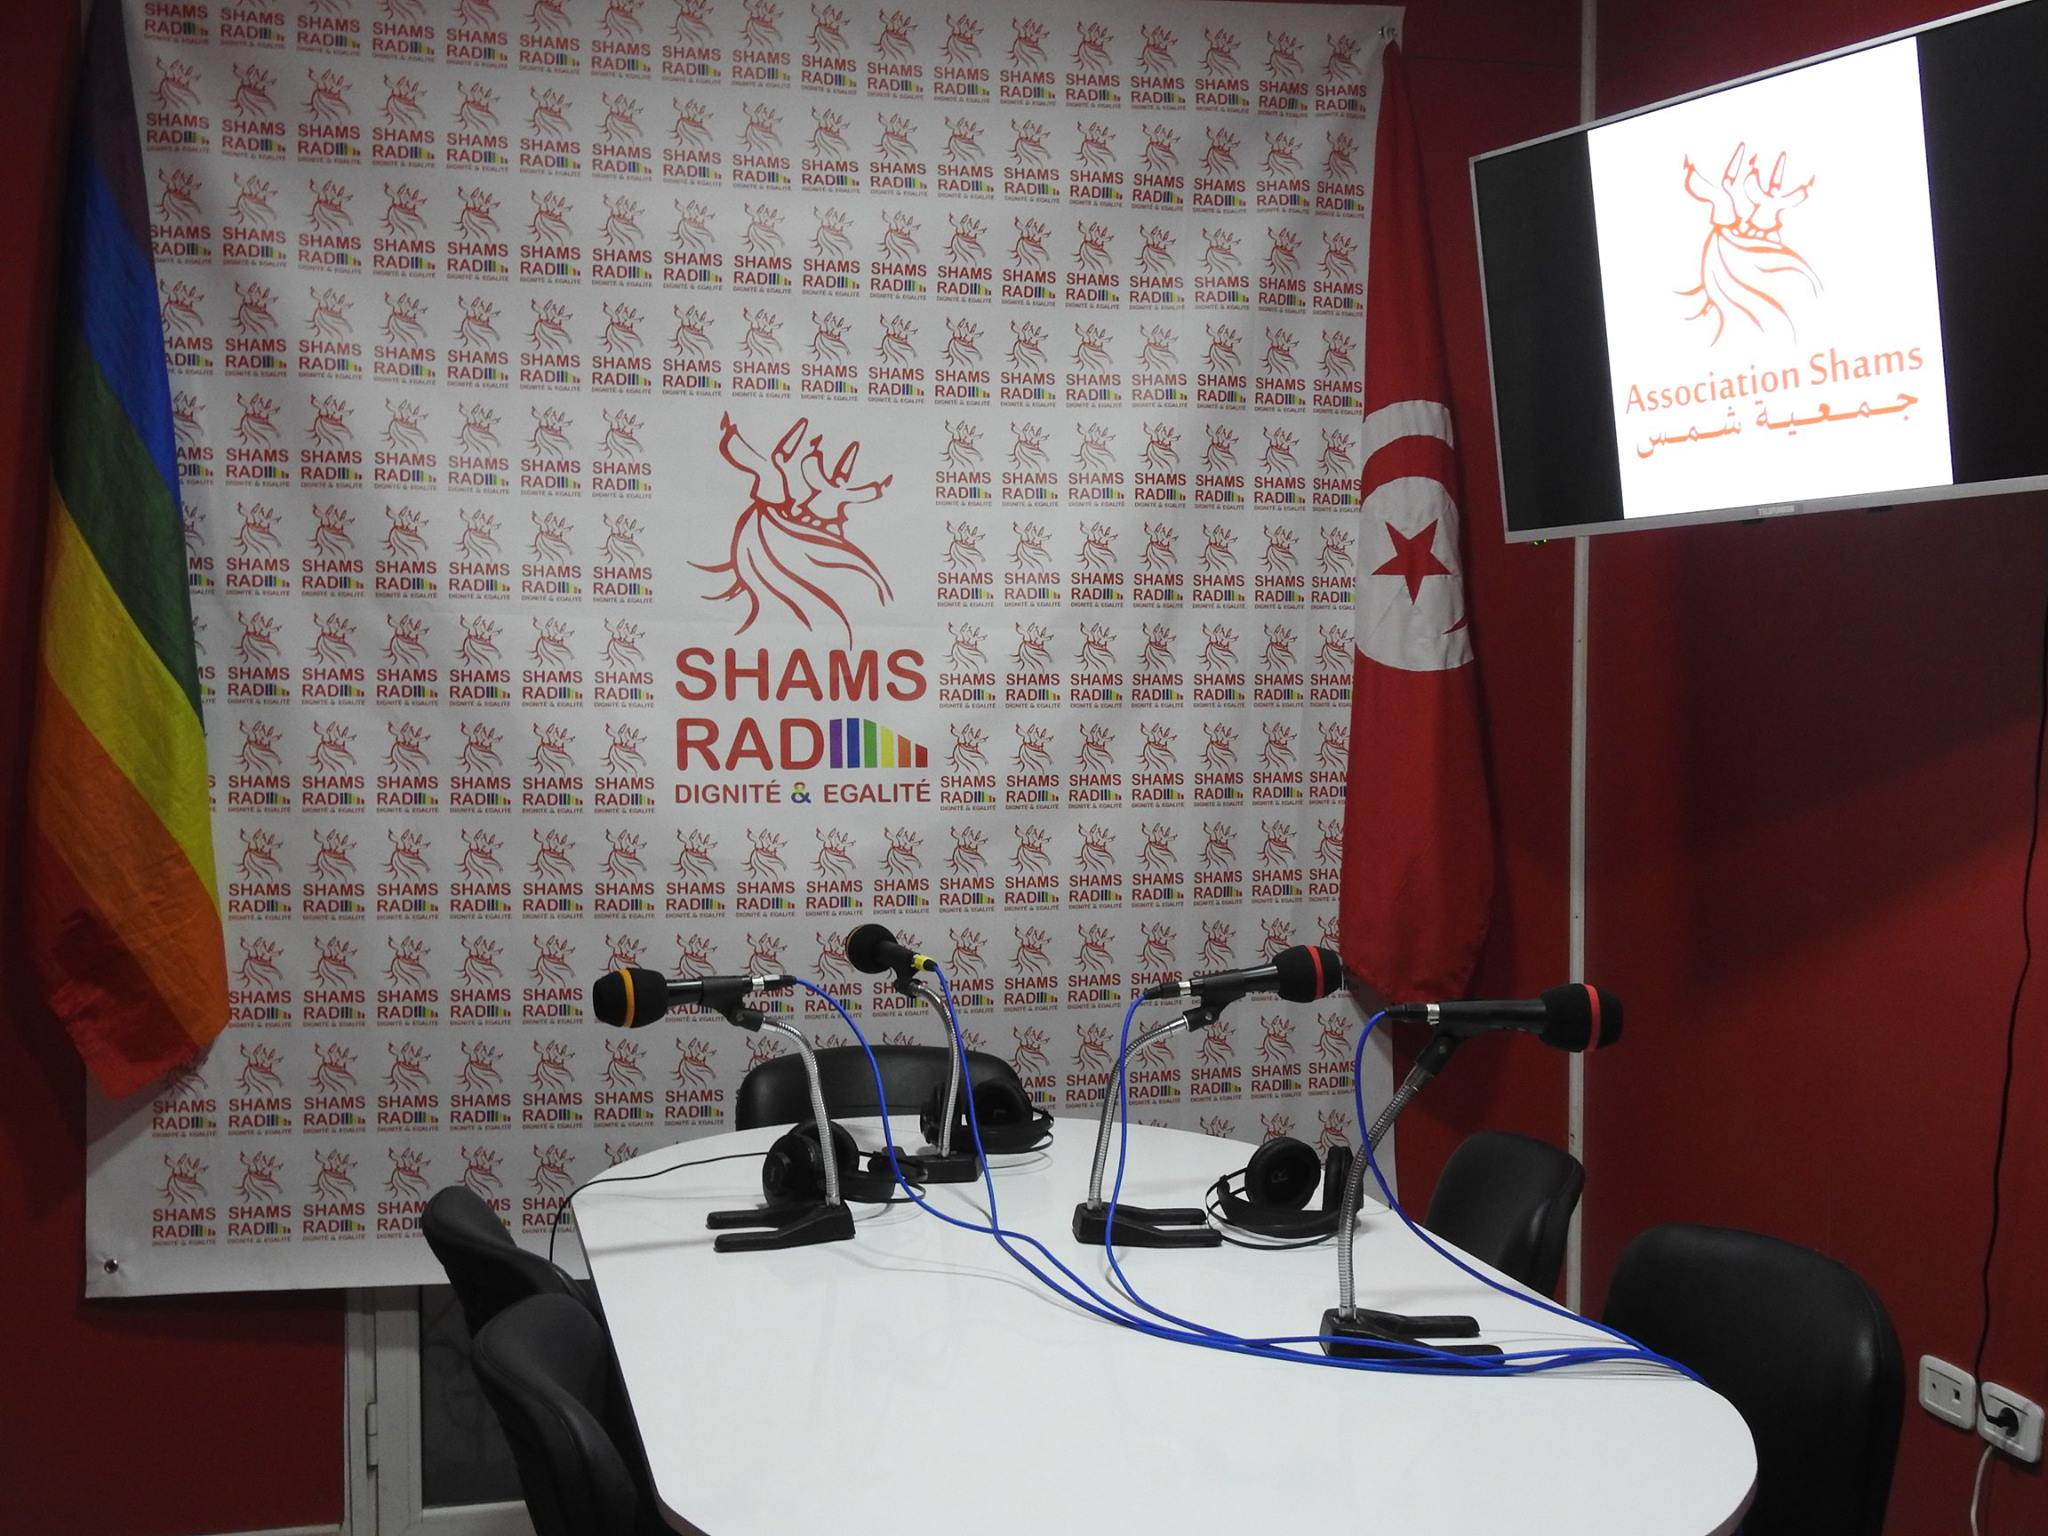 Shams Rad studio (Photo courtesy of Shams Rad via Facebook)